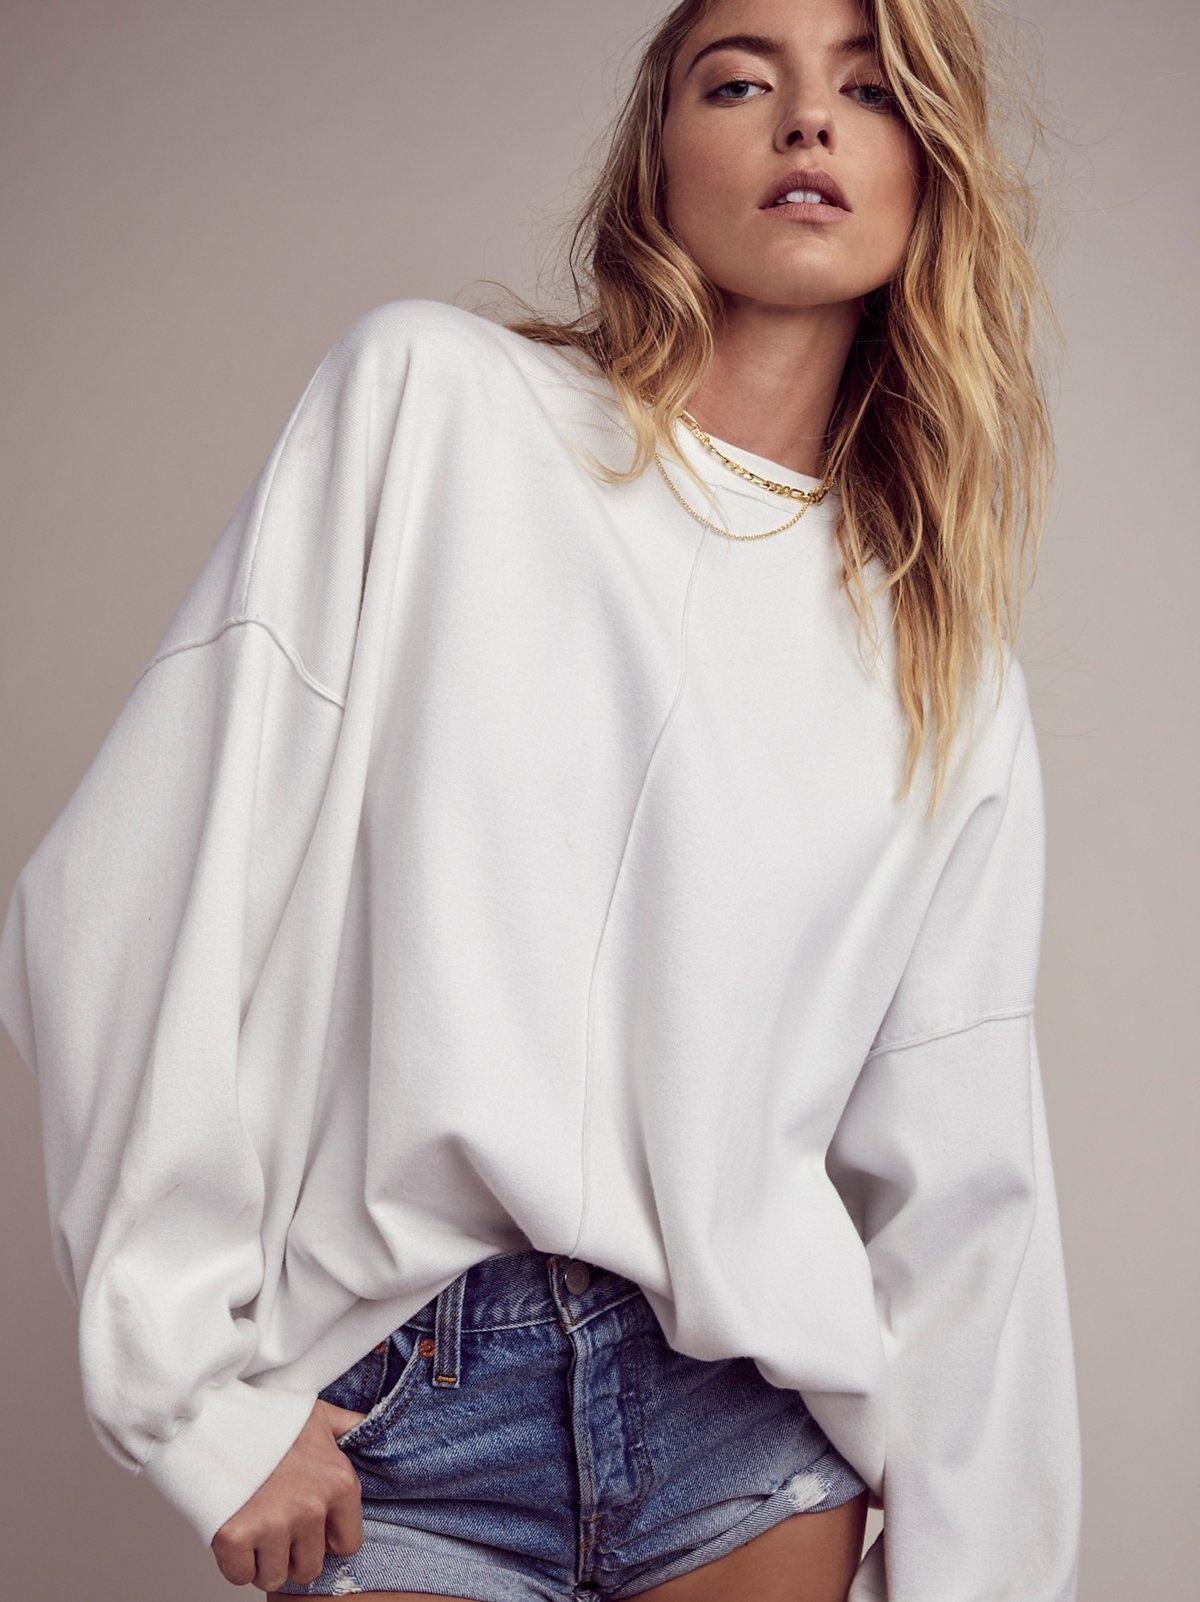 City Girl Sweater